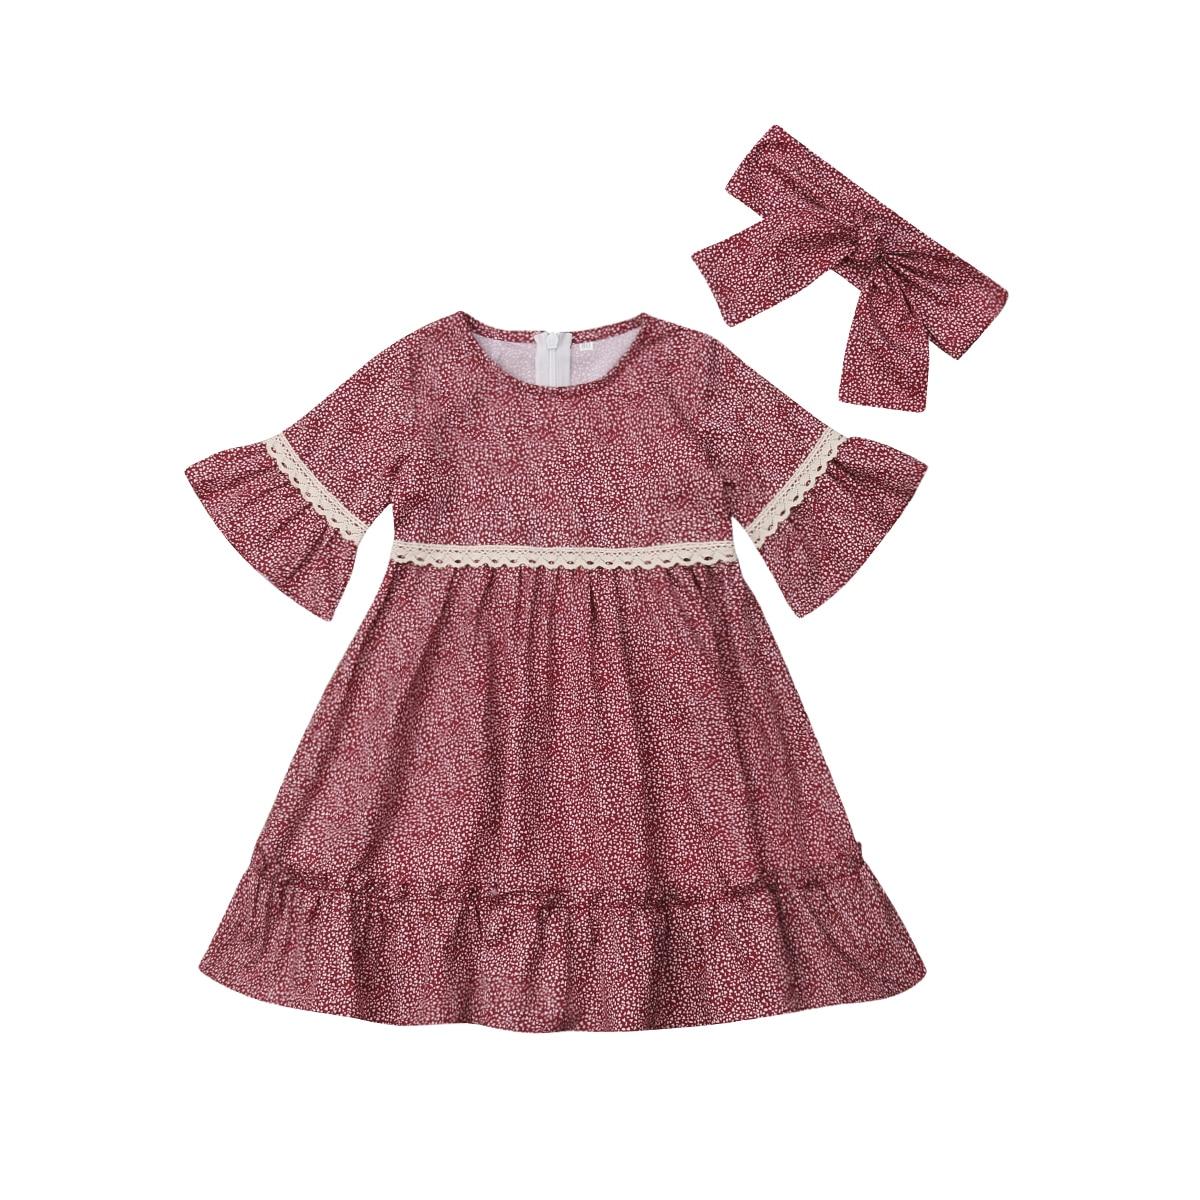 Kids Toddler Girl Floral Dress Long Sleeve Party Pageant Princess Tutu Dress